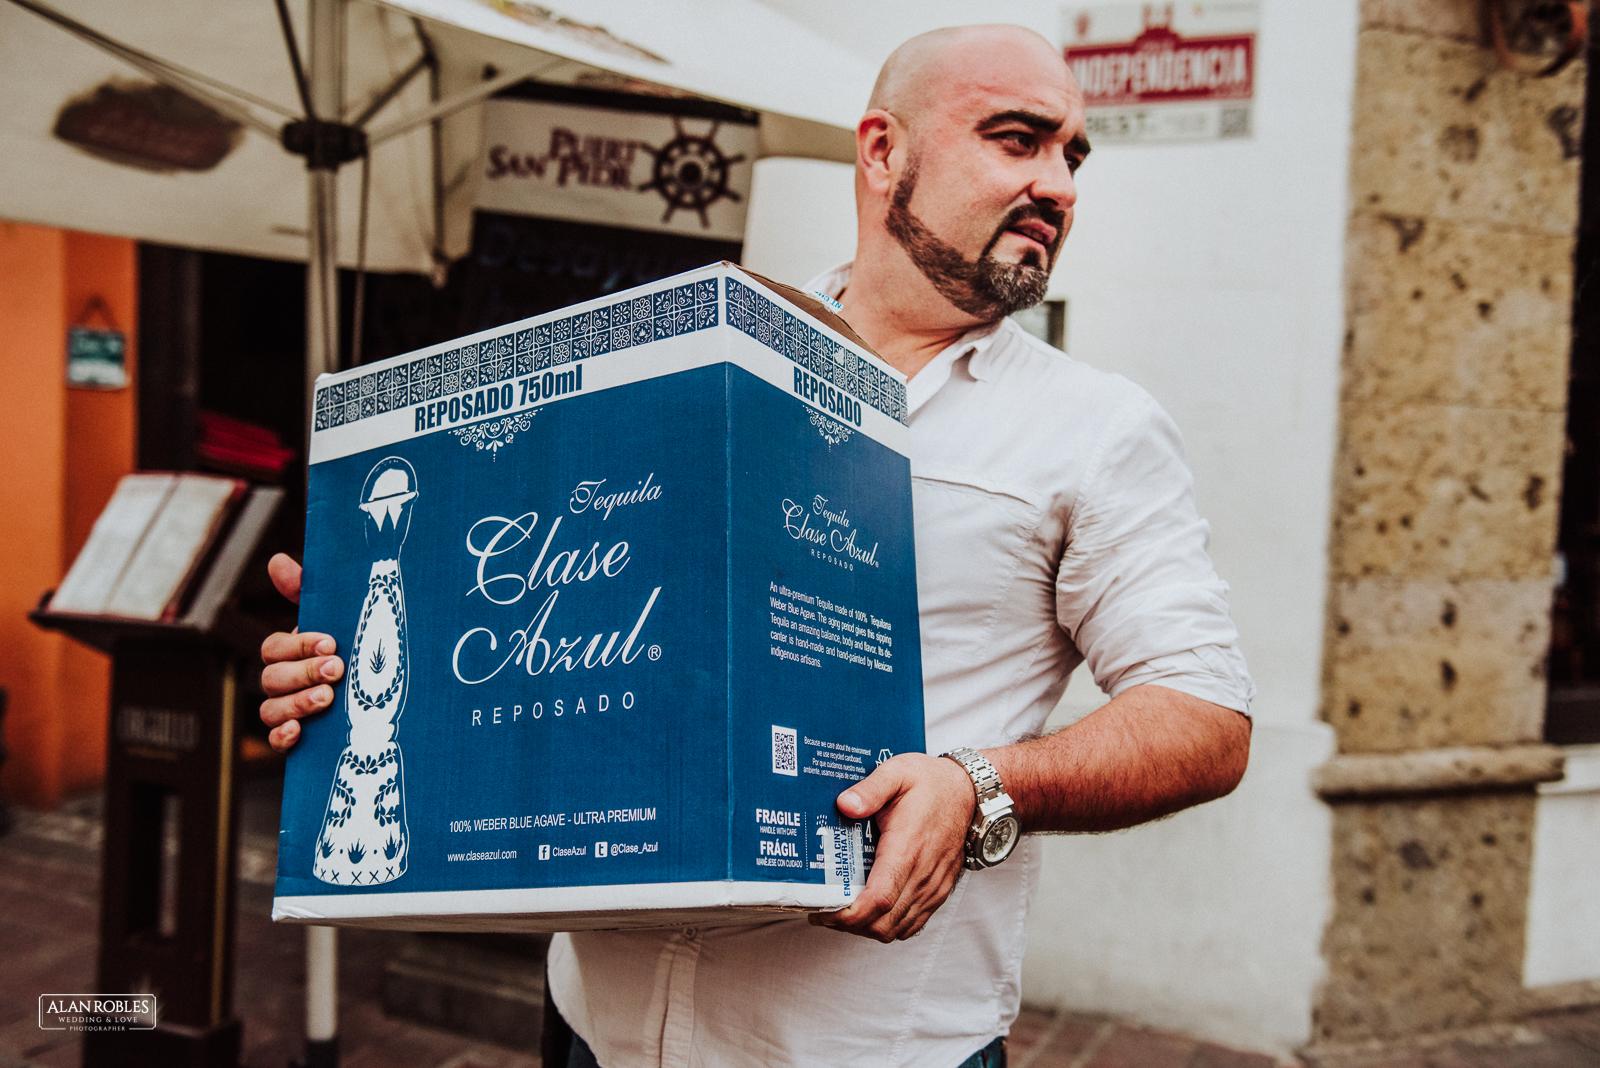 Fotografo de Bodas en Guadalara Alan Robles - Boda en Tlaquepaque Centro historico - Tequila Clase Azul